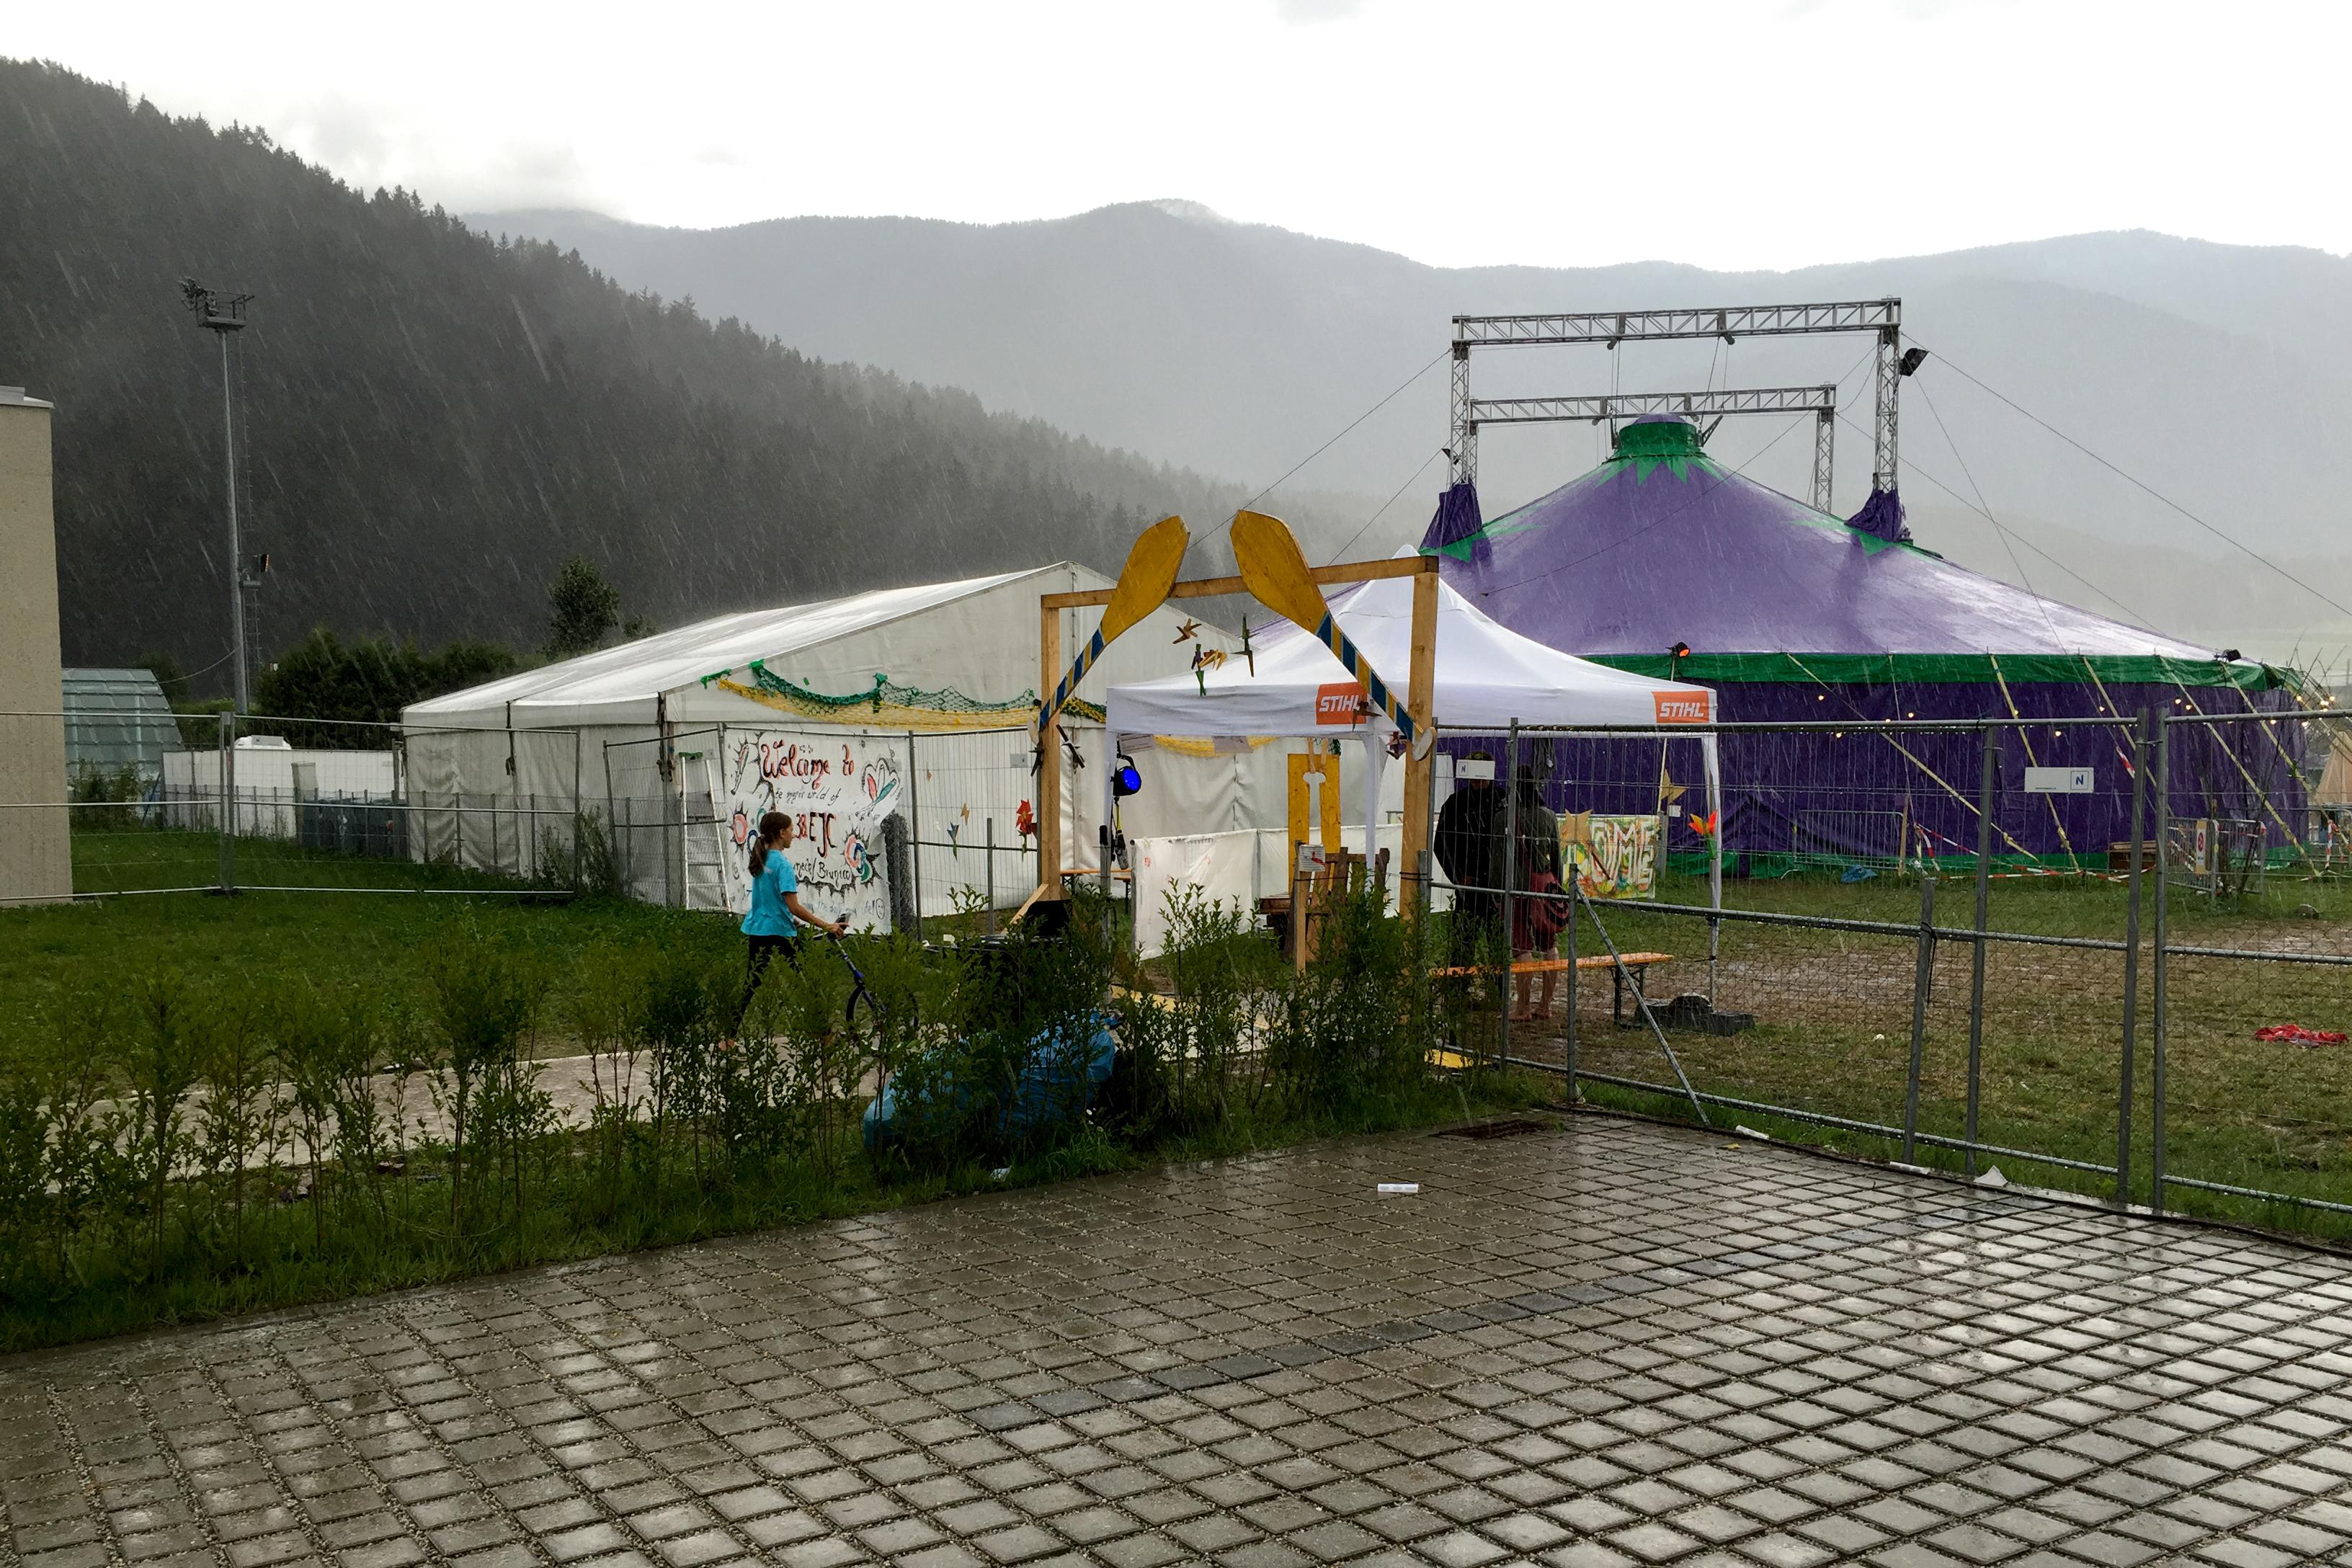 EJC 2015 Bruneck - Saturday August 8th: Saturday rain.